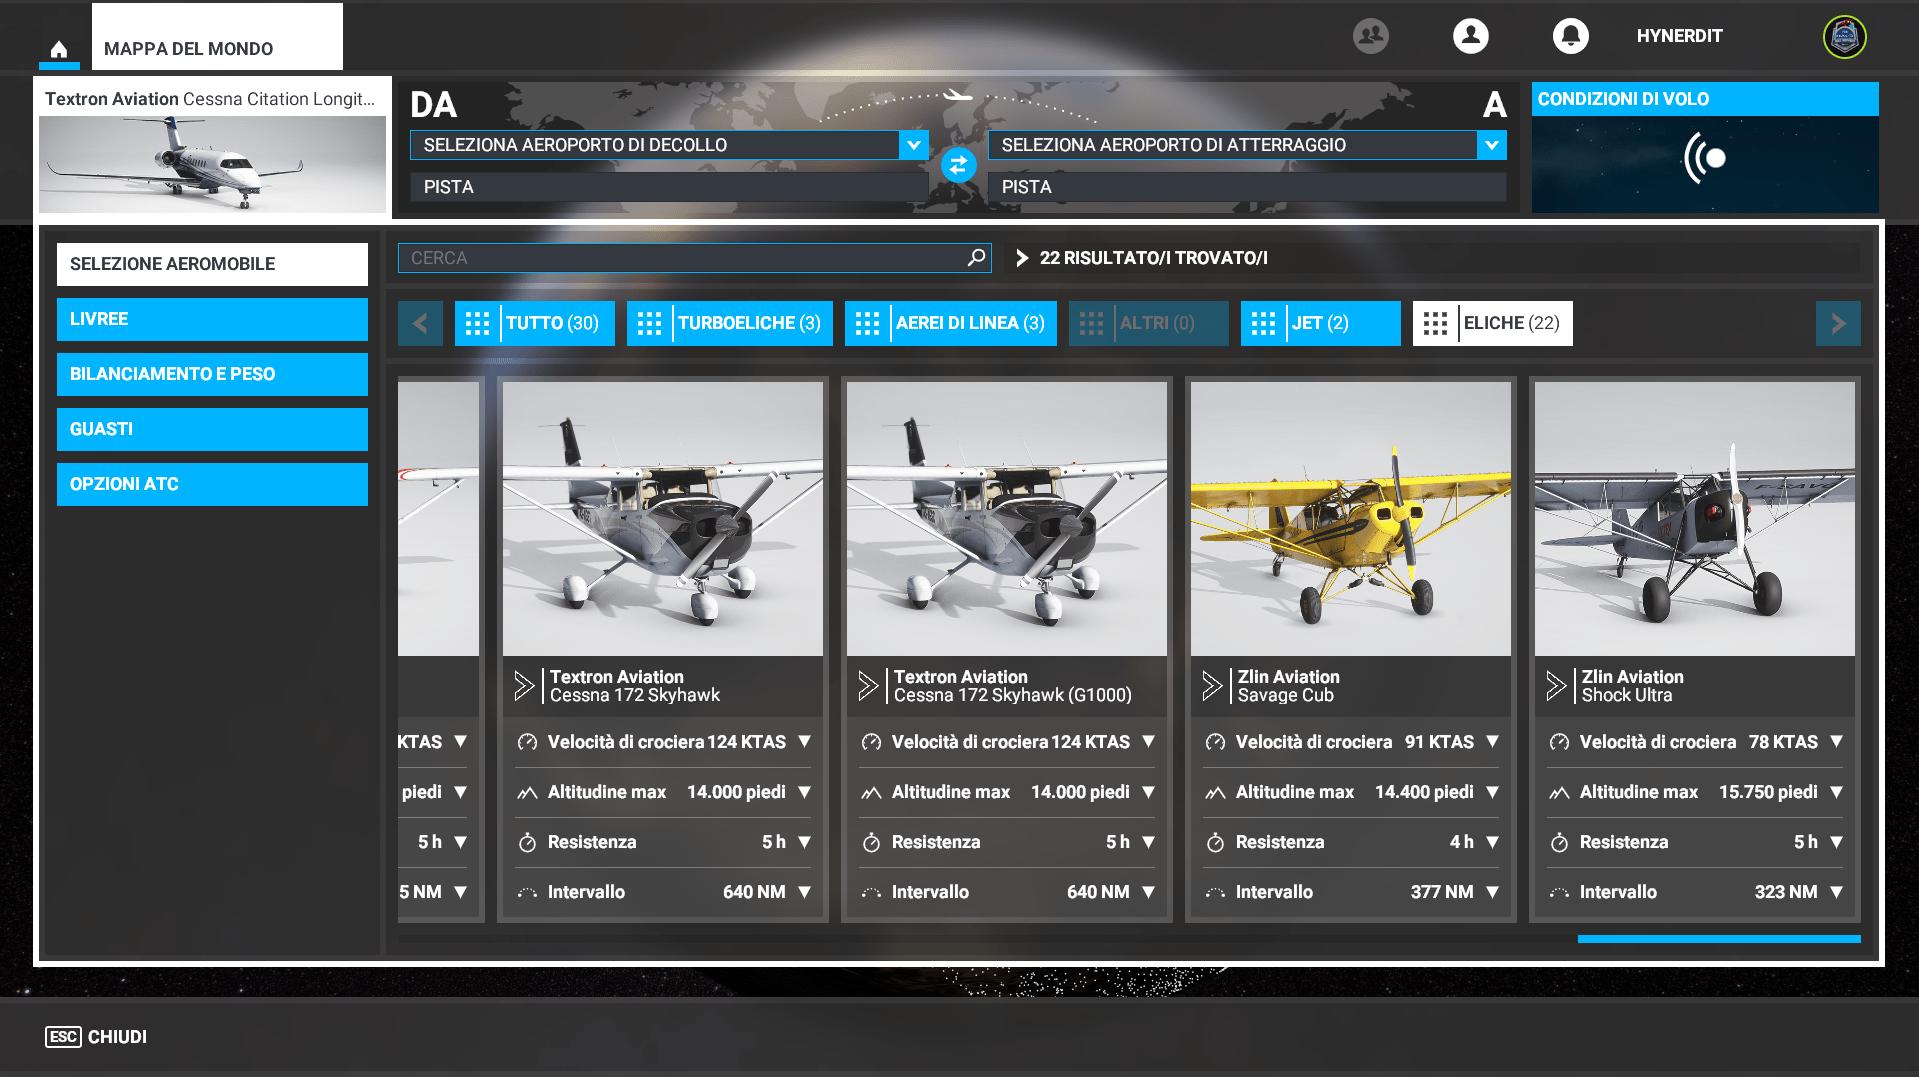 Microsoft Flight Simulator 2020: La Recensione 14 - Hynerd.it